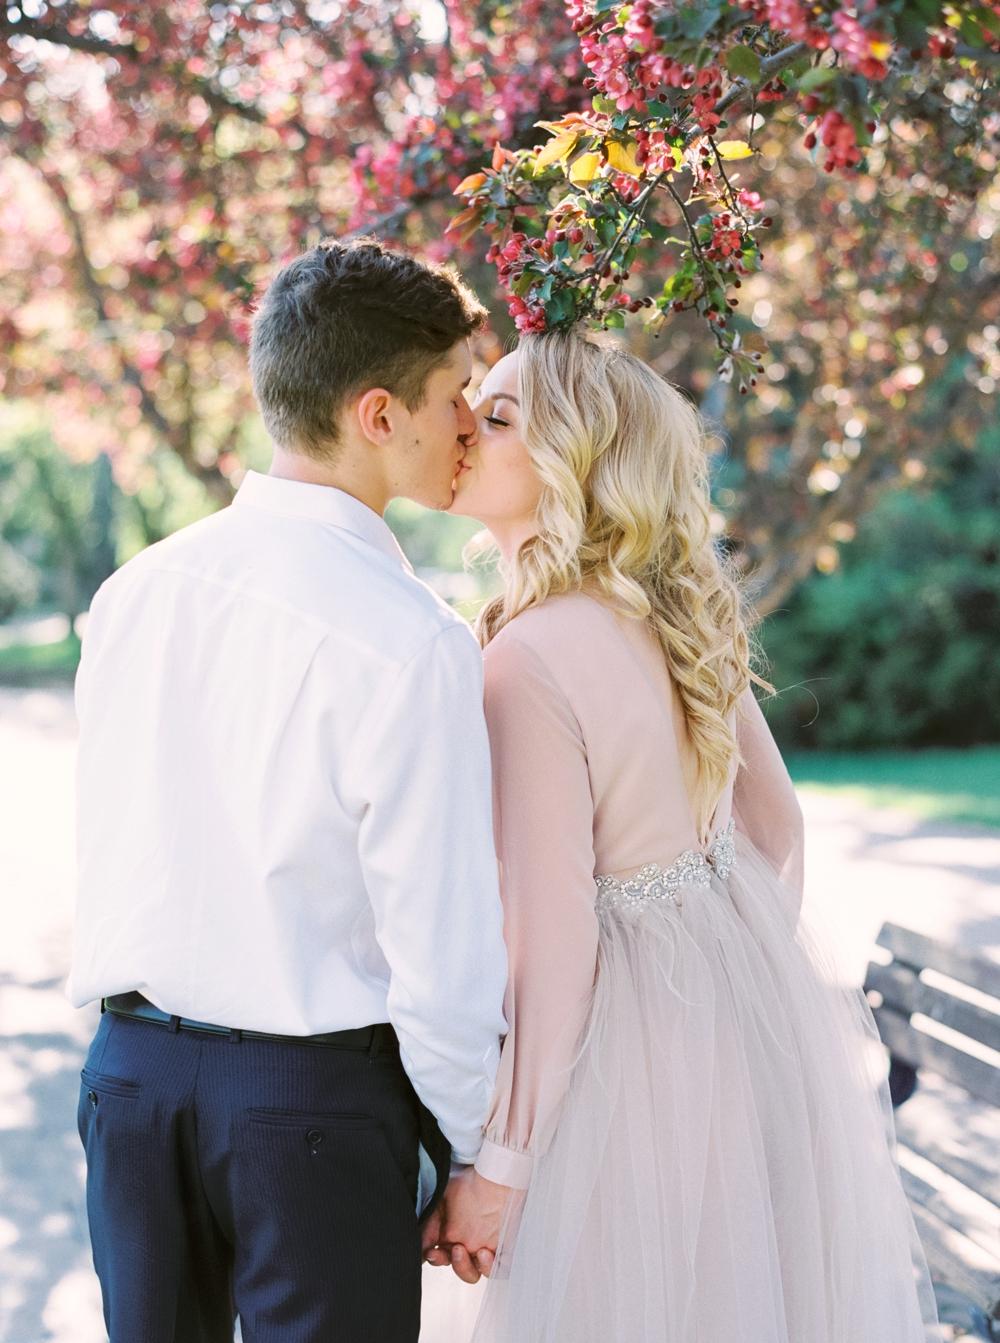 Calgary Wedding Photographers | Cherry Blossoms Wedding | Blush Wedding Dress | Bridal Editorial